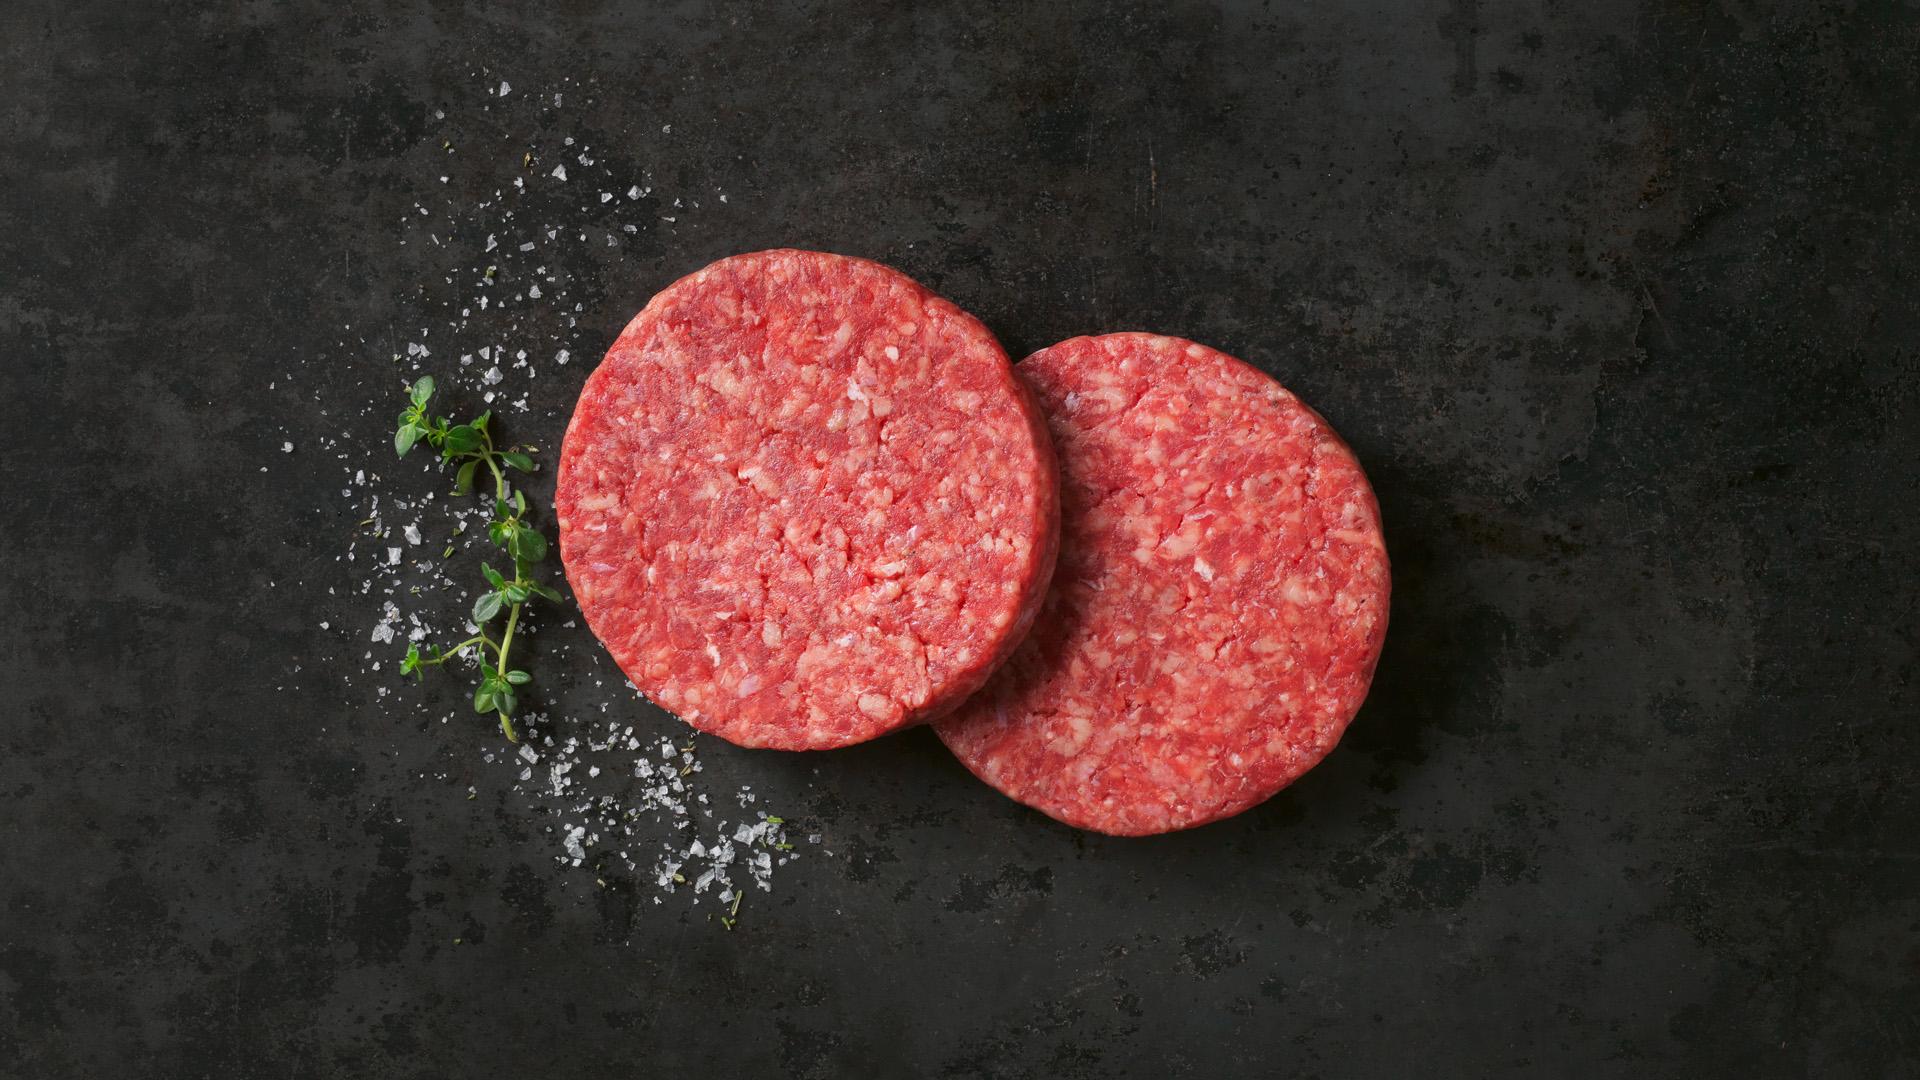 Hofstädter FzT Beef Burger SV